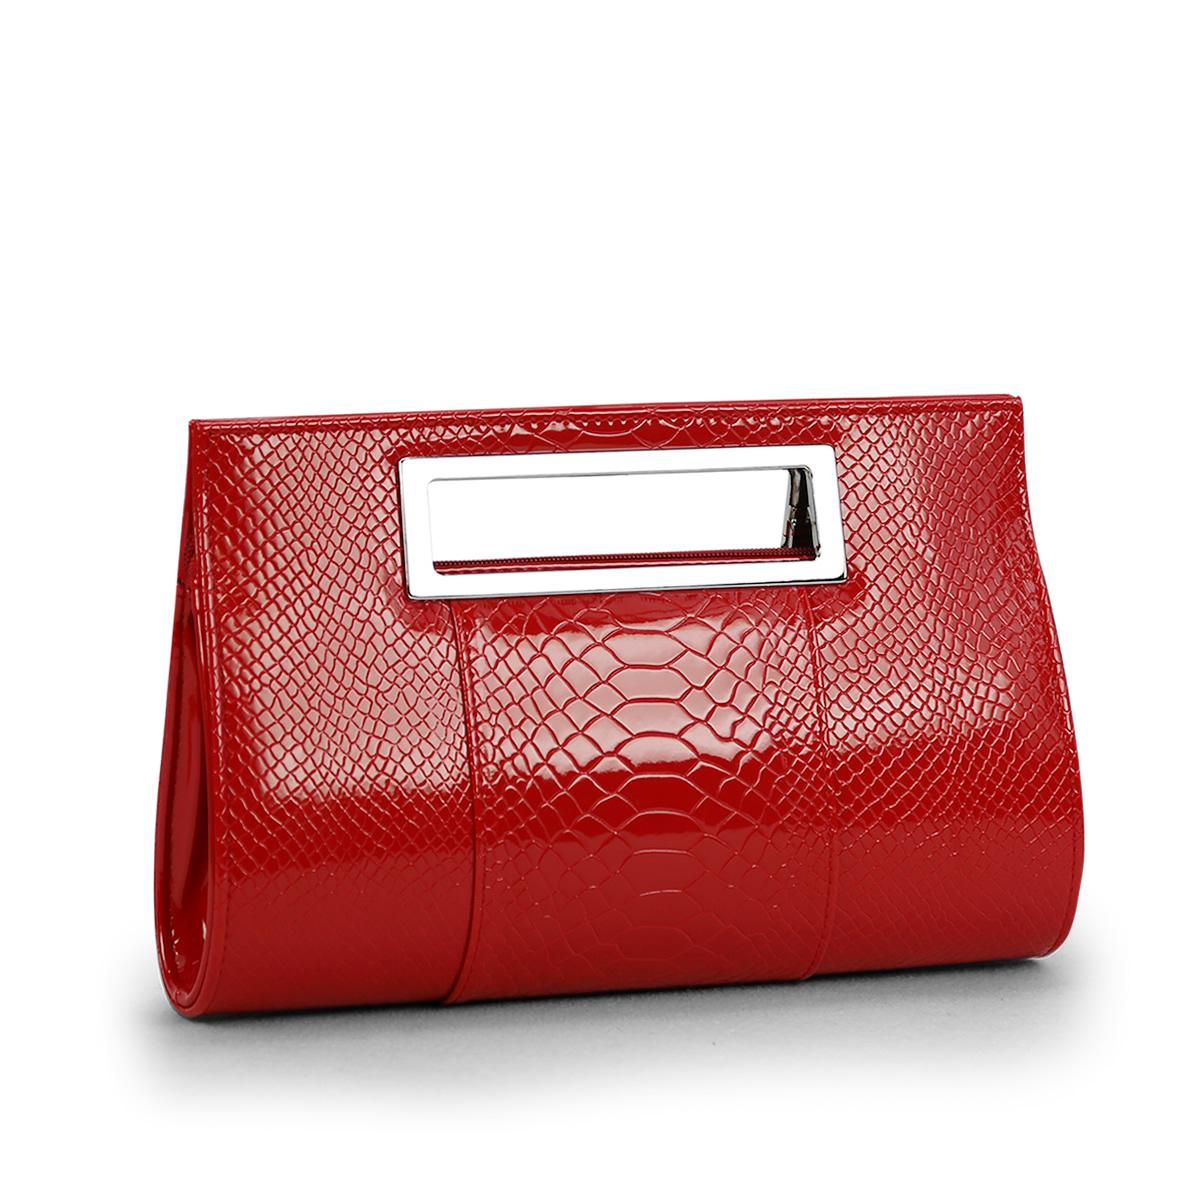 Fashion lady bag 2020 smooth crocodile print PU leather hand bag single shoulder side backpack straddle bag